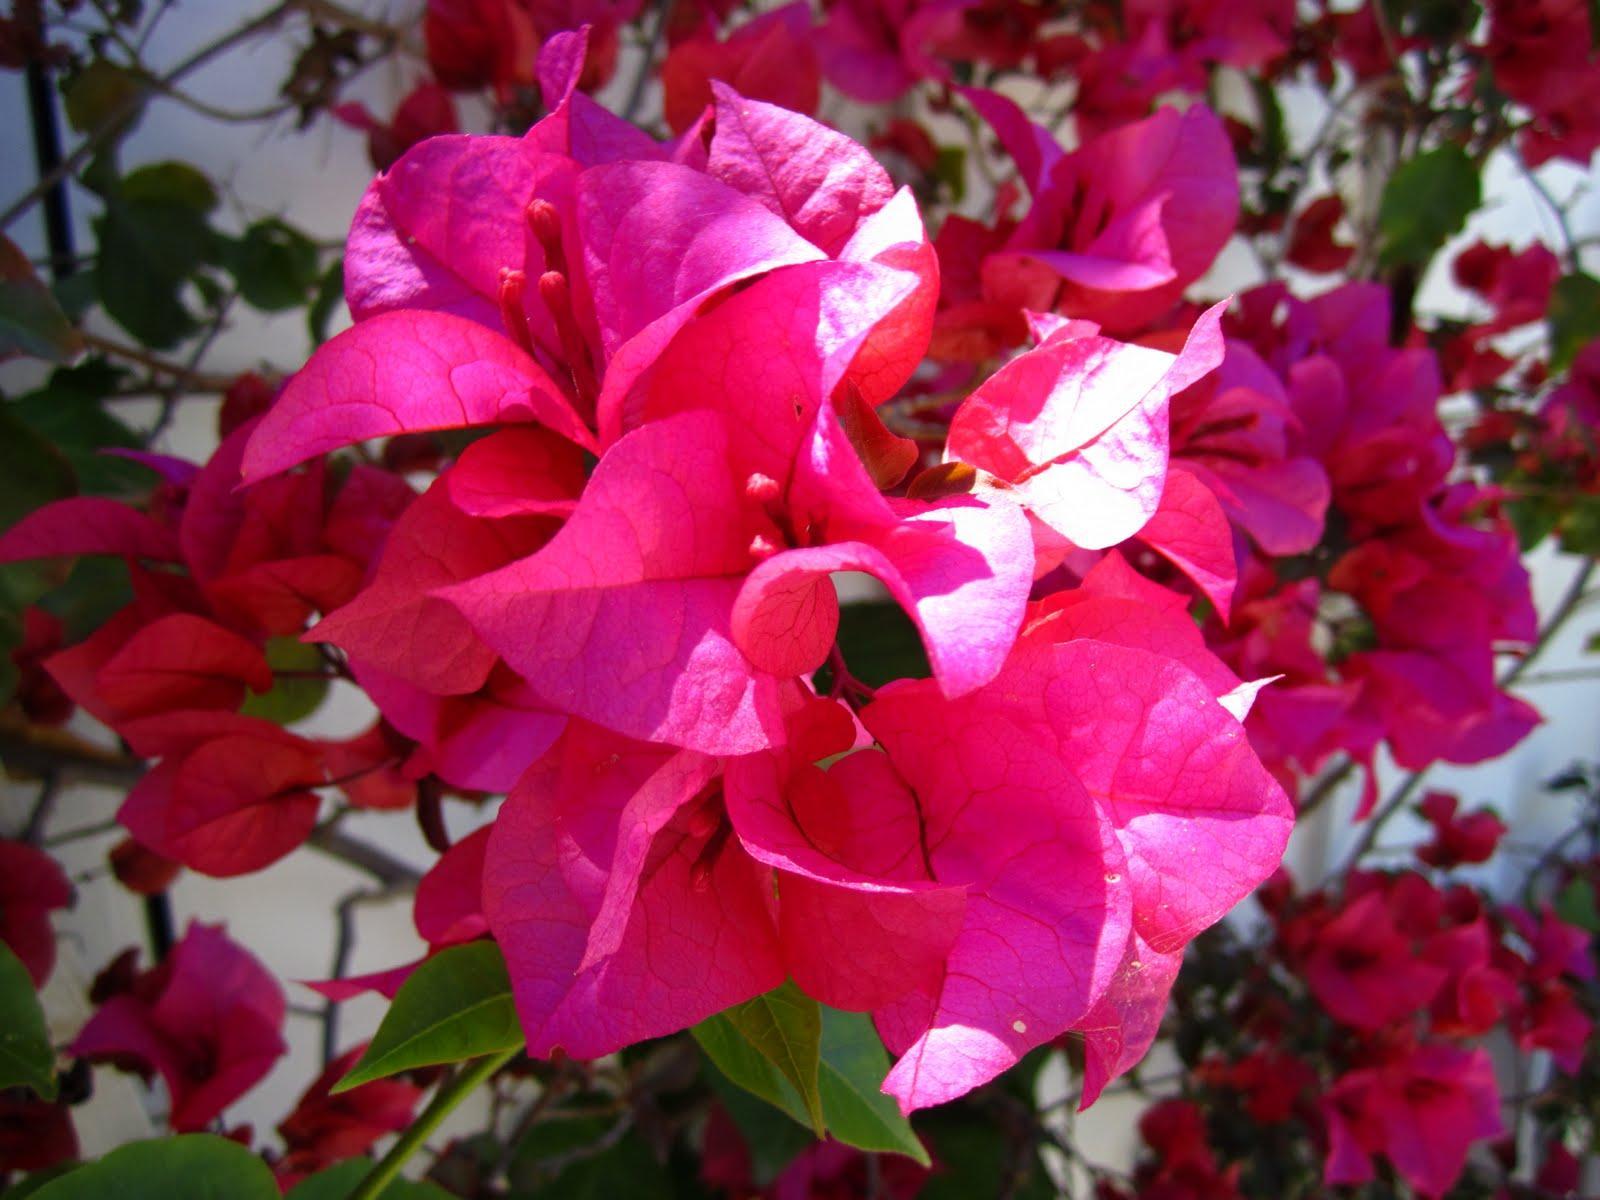 Hot pink bougainvillea in my